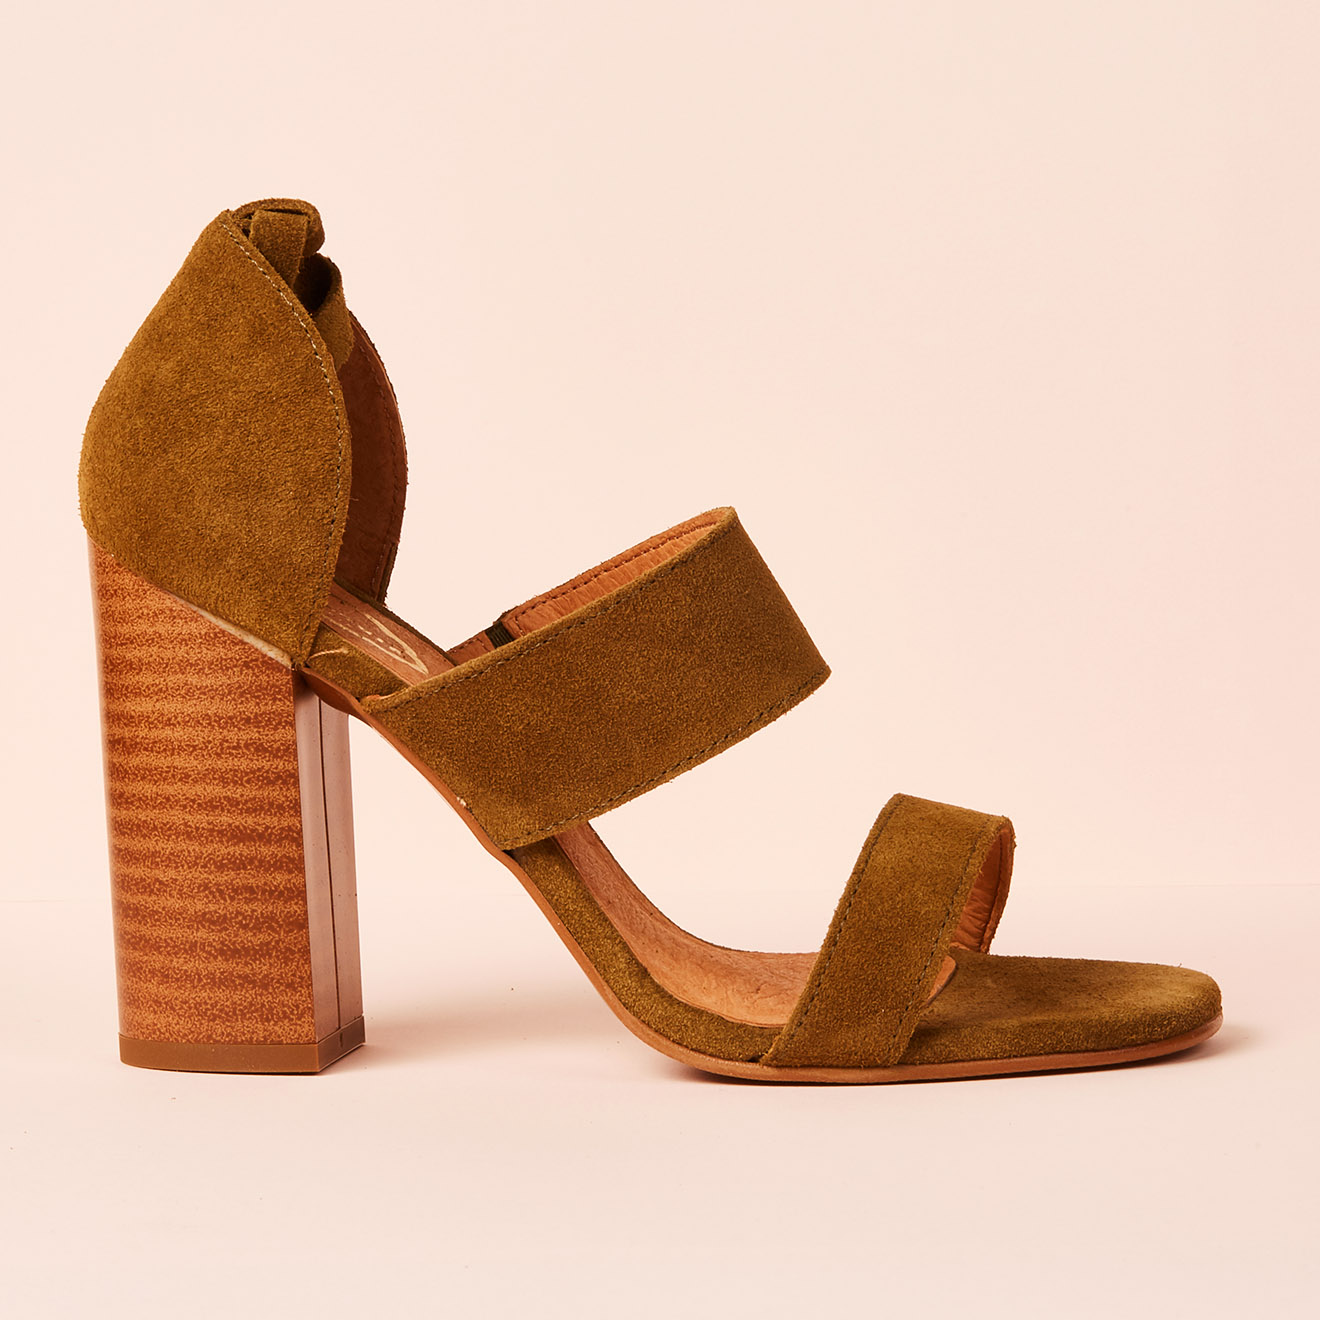 Sandales en Velours de Cuir kaki - Talon 10 cm - Apologie - Modalova